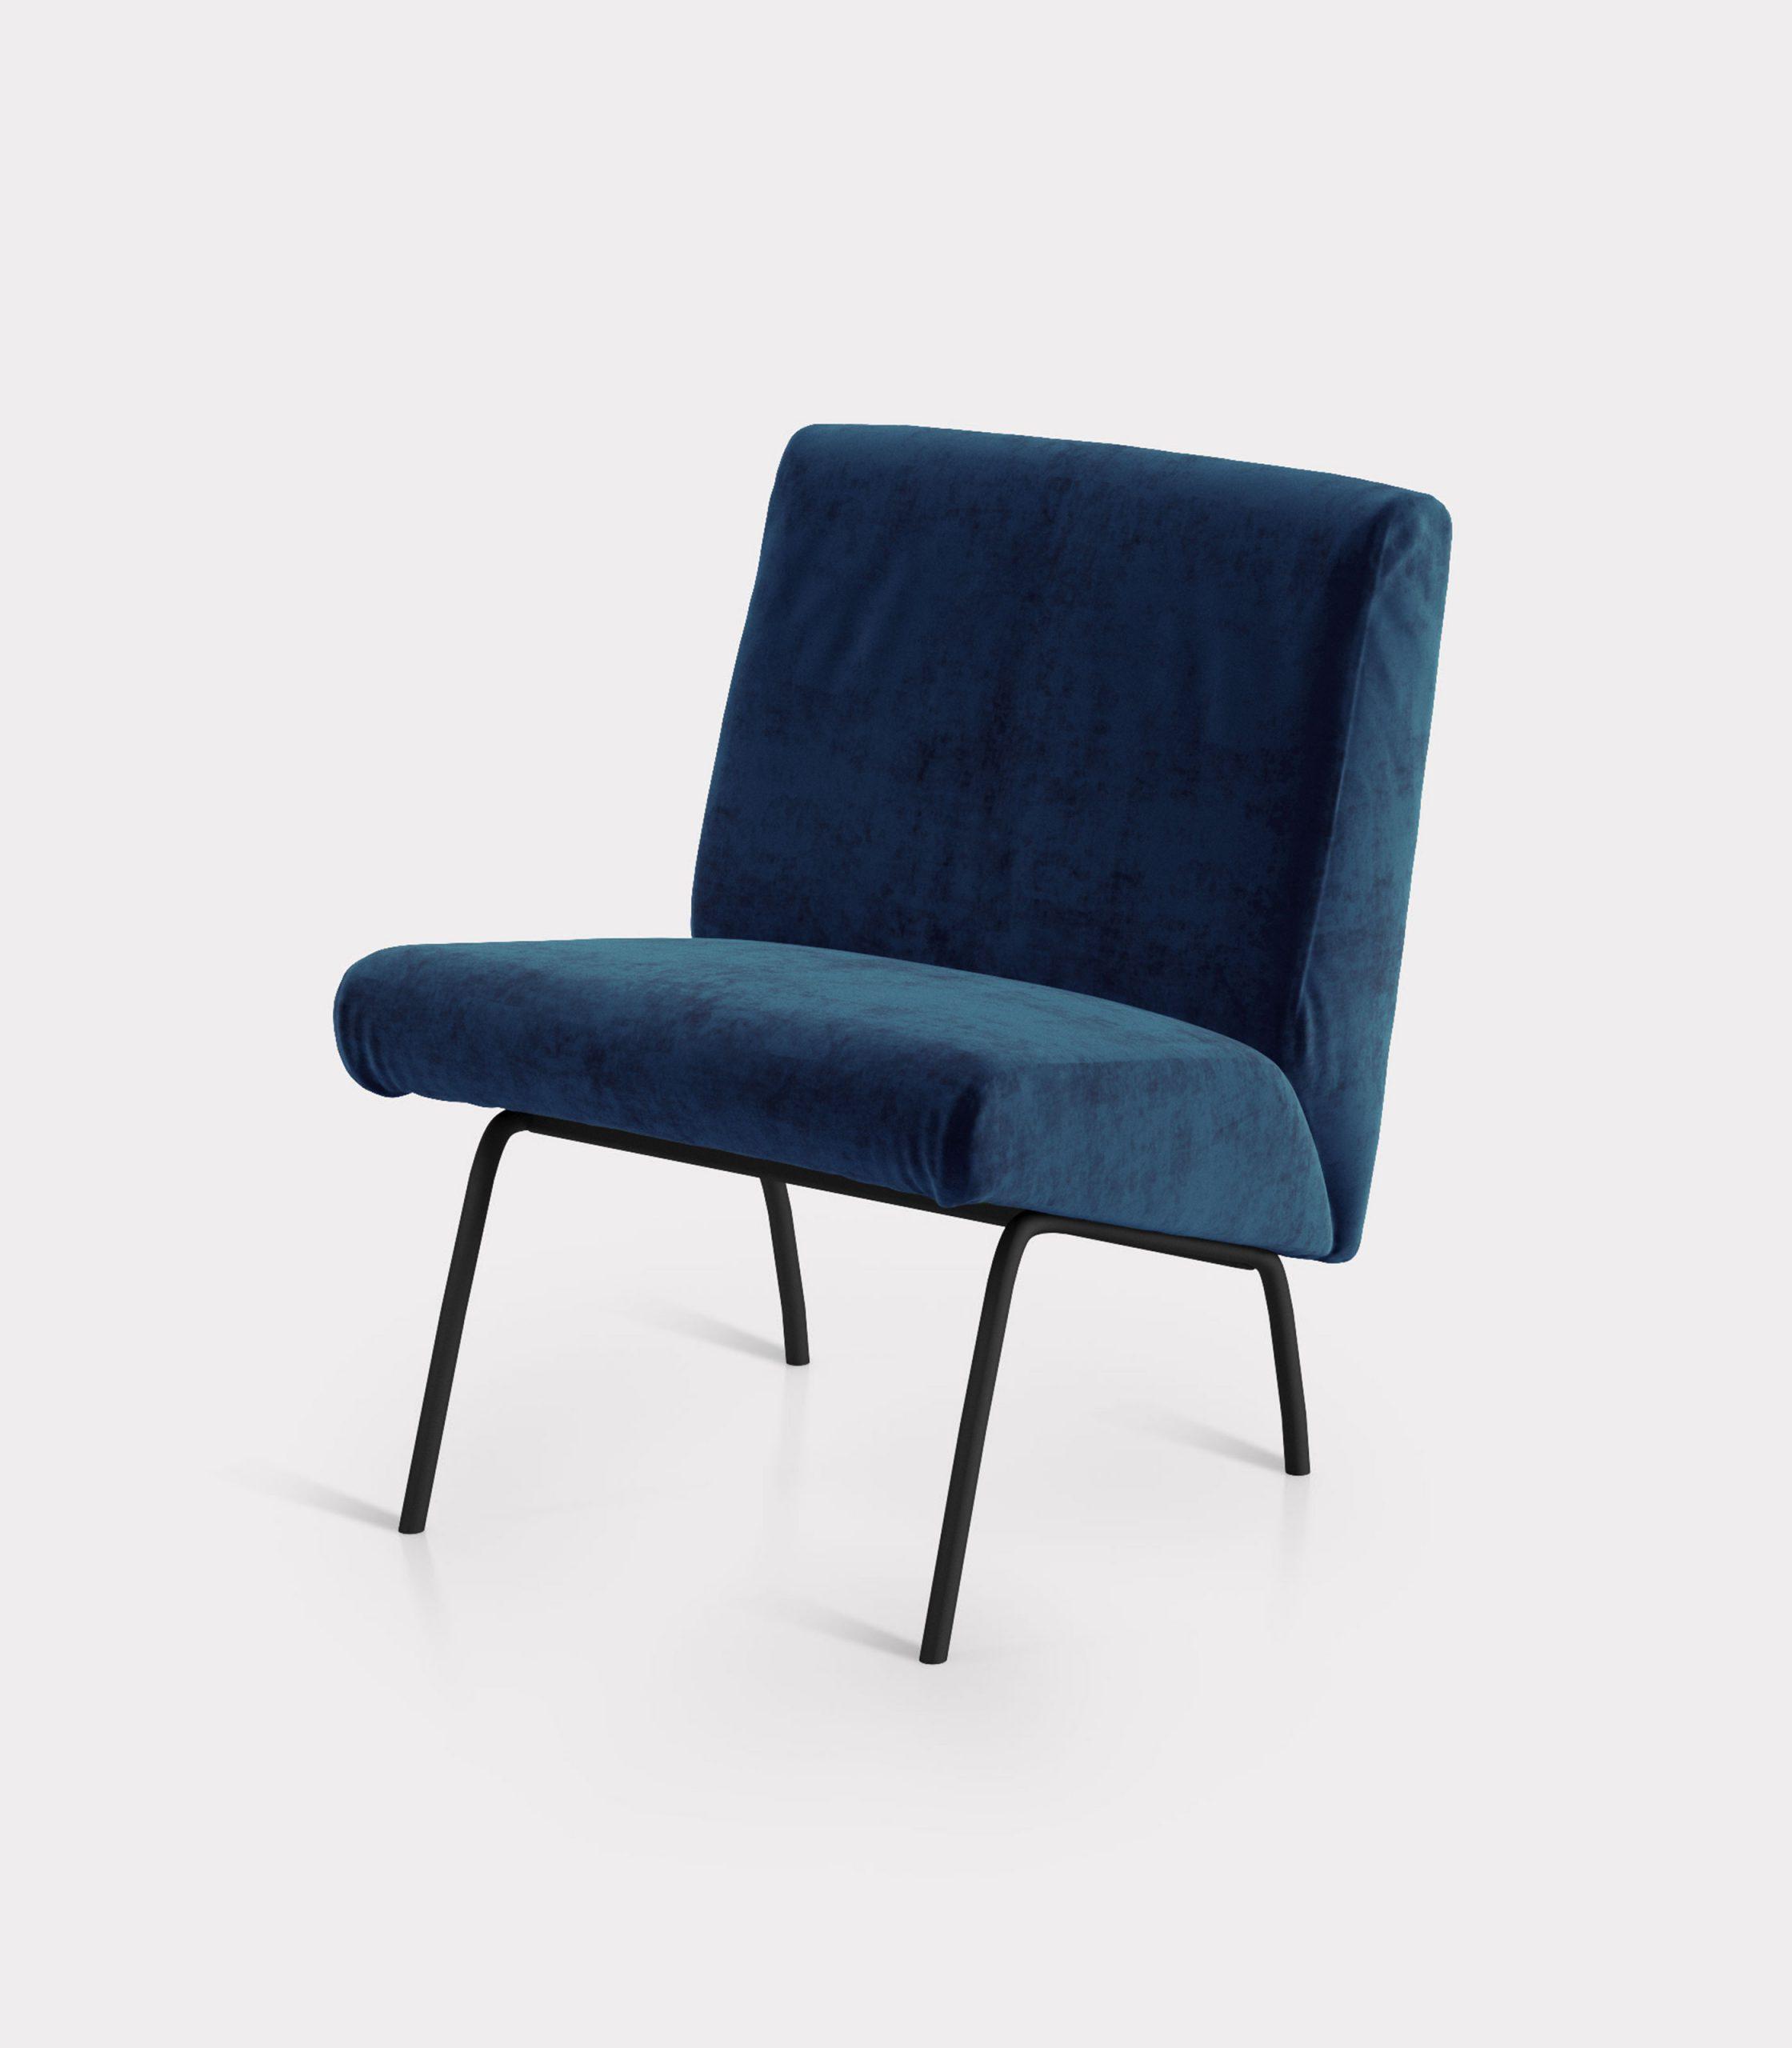 Blue armchair in velvet fabric loopo milan design FS